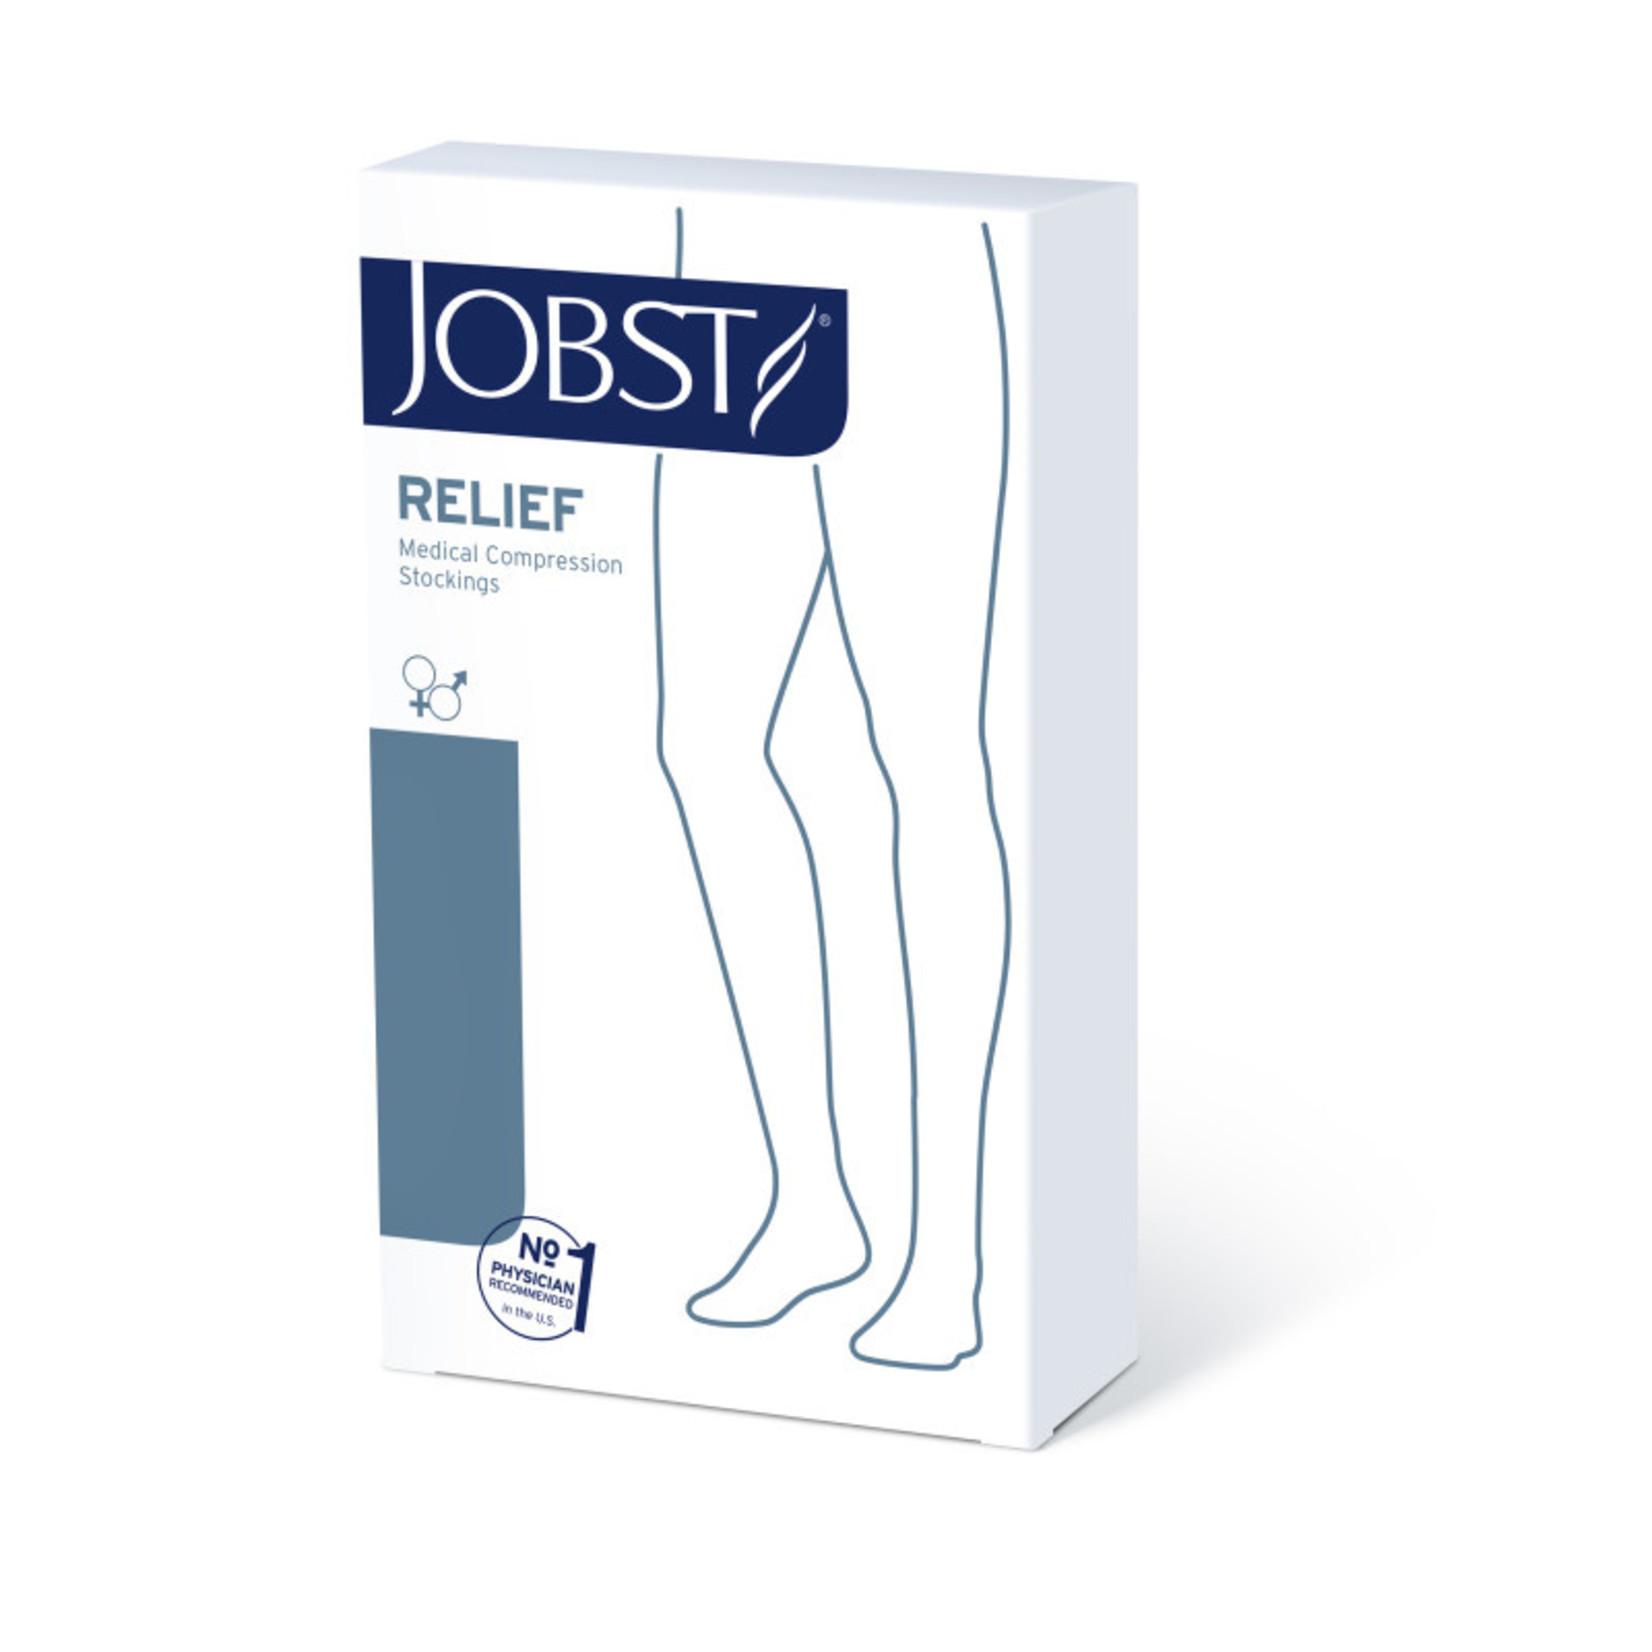 JOBST JOBST Relief Full Chap, 20-30 mmHg Open Toe,